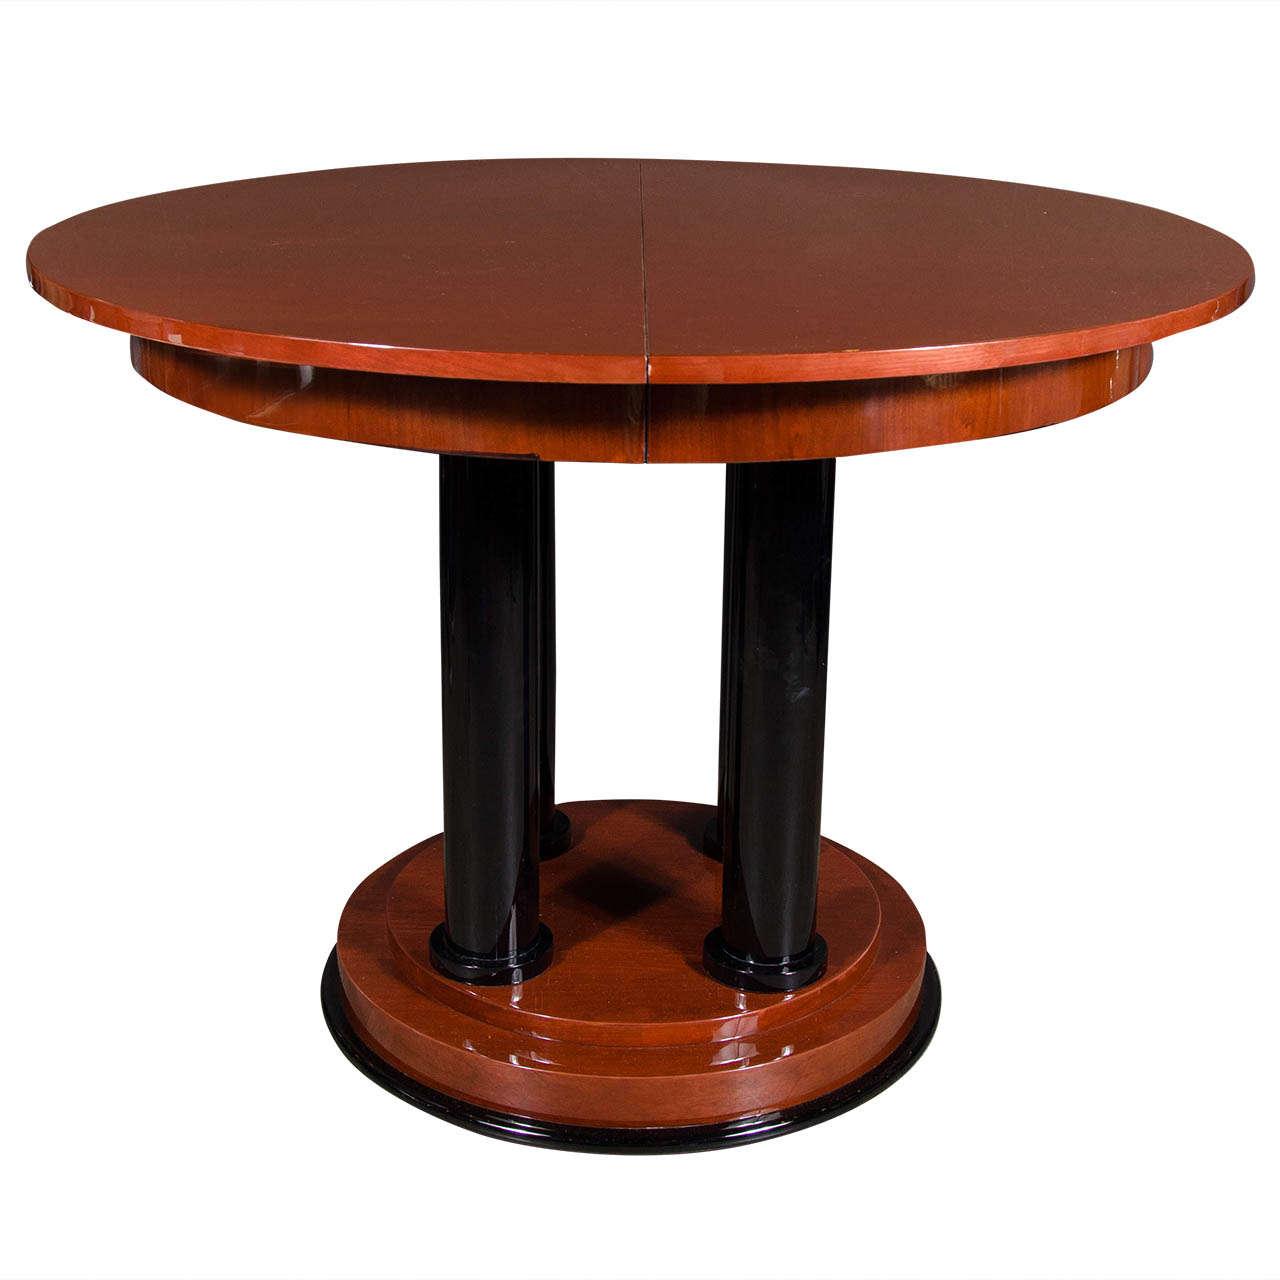 Elegant Art Deco Four Pedestal Center Hall Table/Dining ...